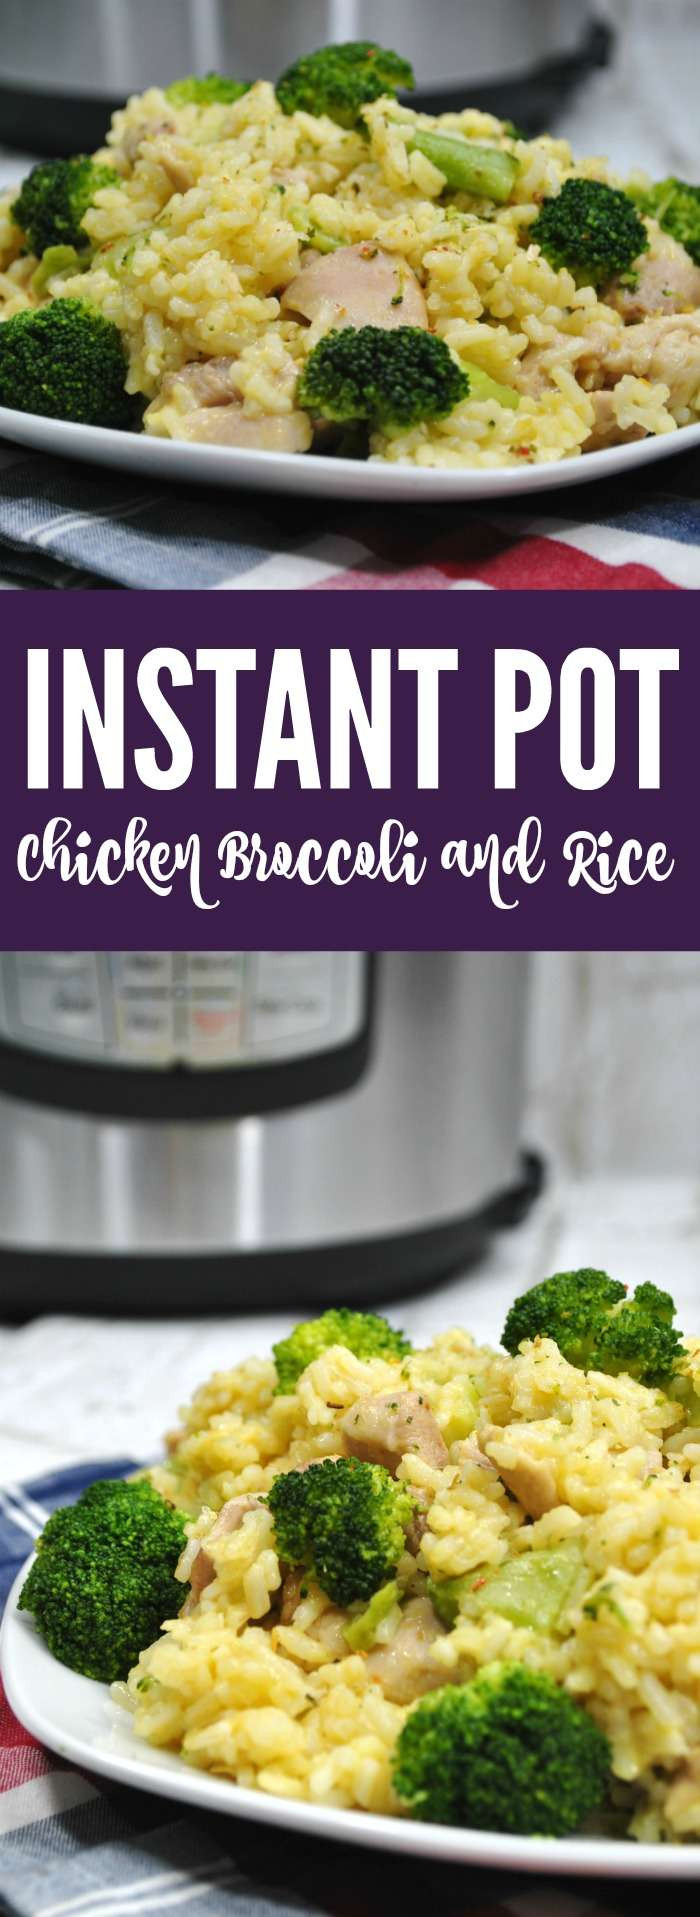 Instant Pot Chicken And Broccoli  Instant Pot Chicken Broccoli Rice Recipe Passion for